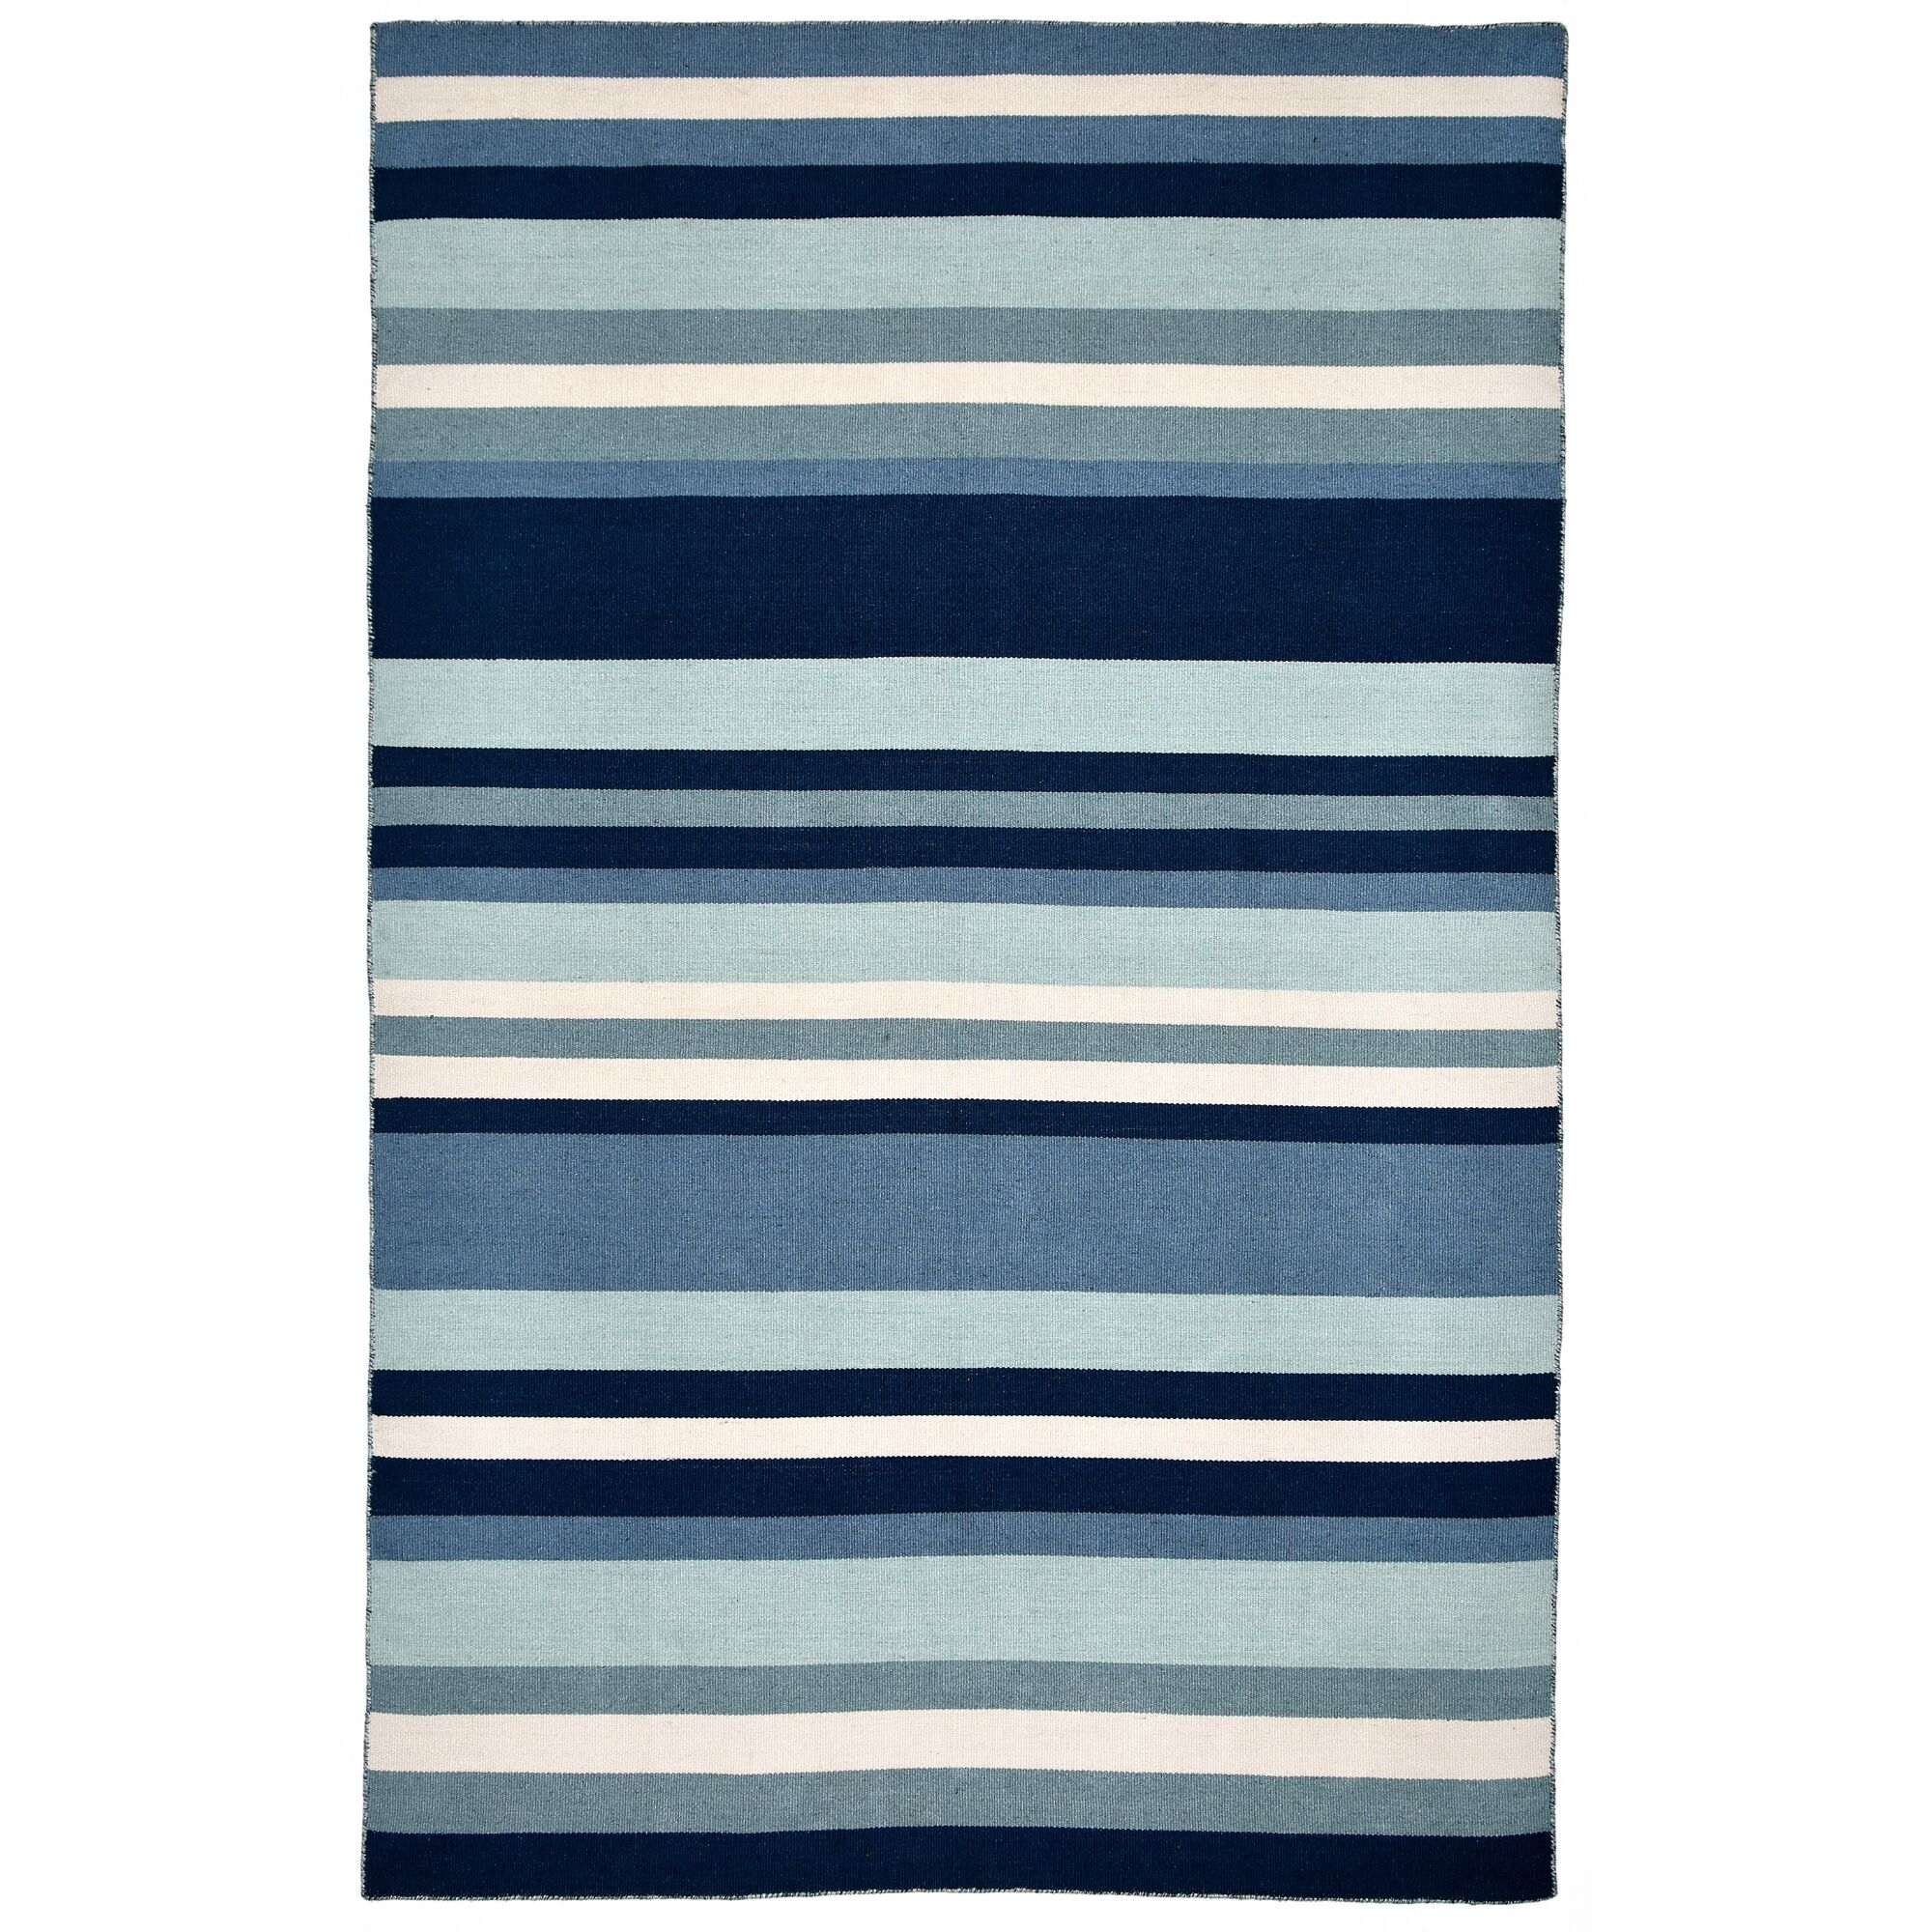 Ranier Hand-Woven Blue Indoor/Outdoor Area Rug Rug Size: Rectangle 3'6